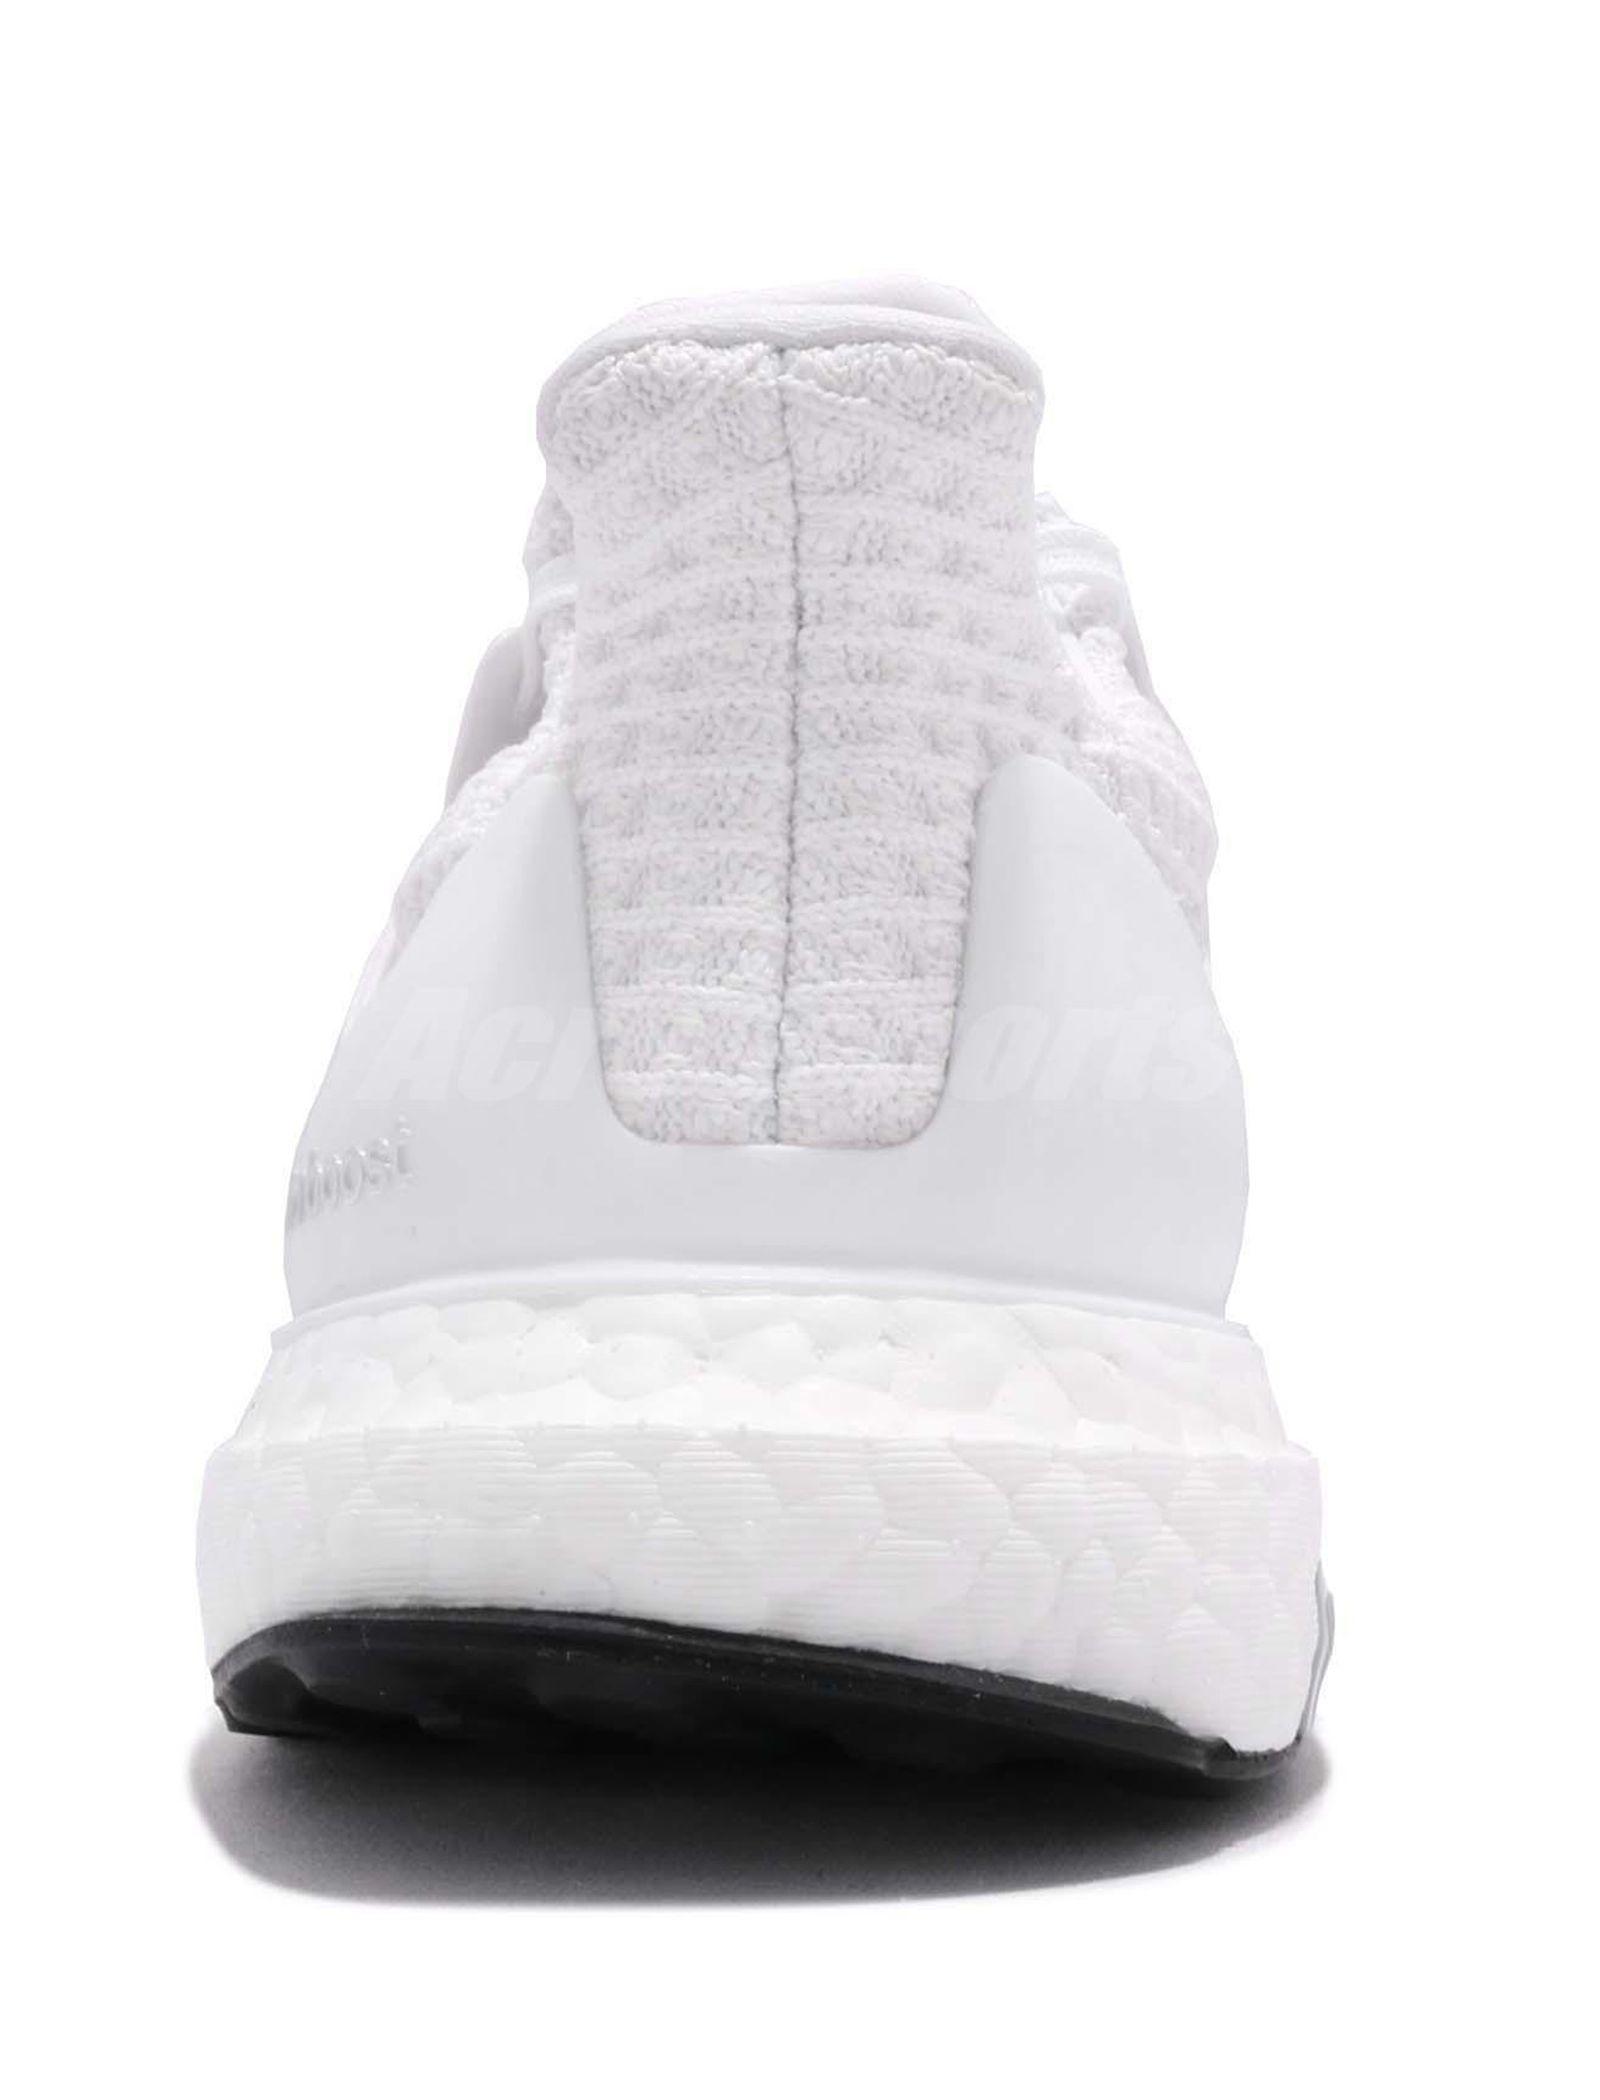 کفش مخصوص دویدن زنانه آدیداس مدل ULTRABOOST - سفيد - 4